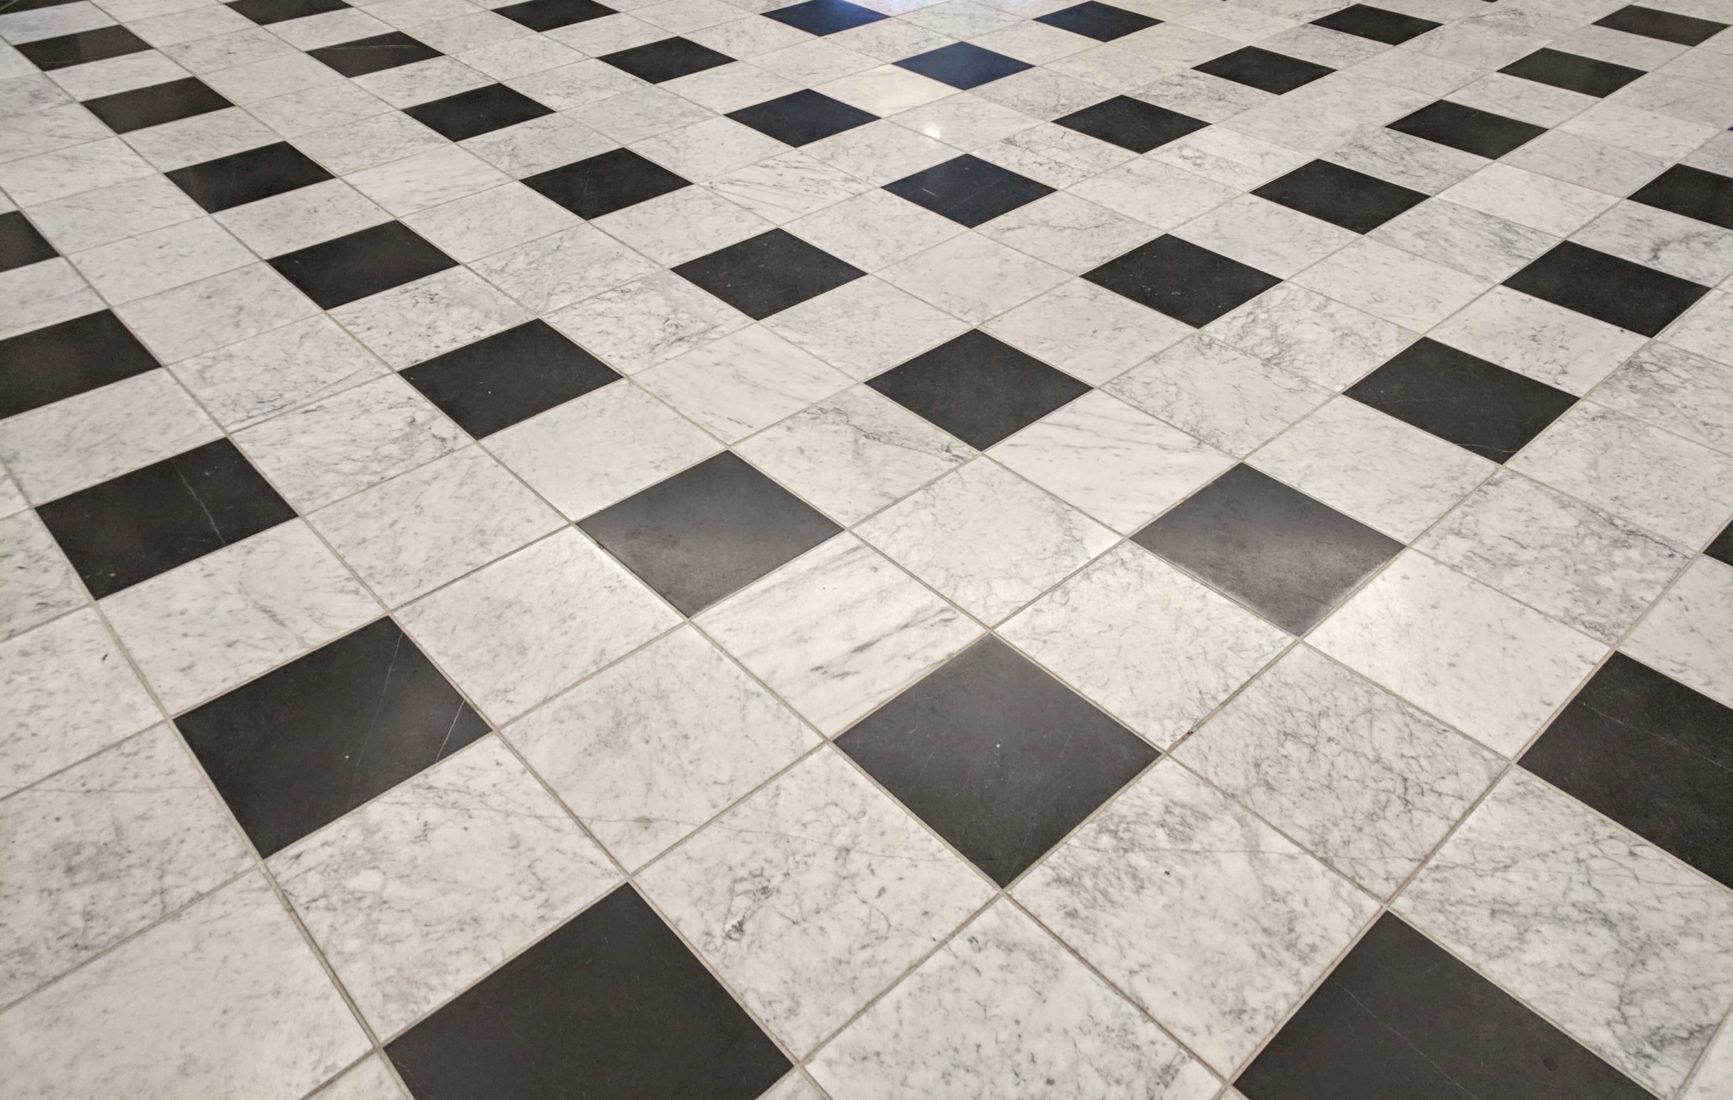 black and white marble tiles on floor